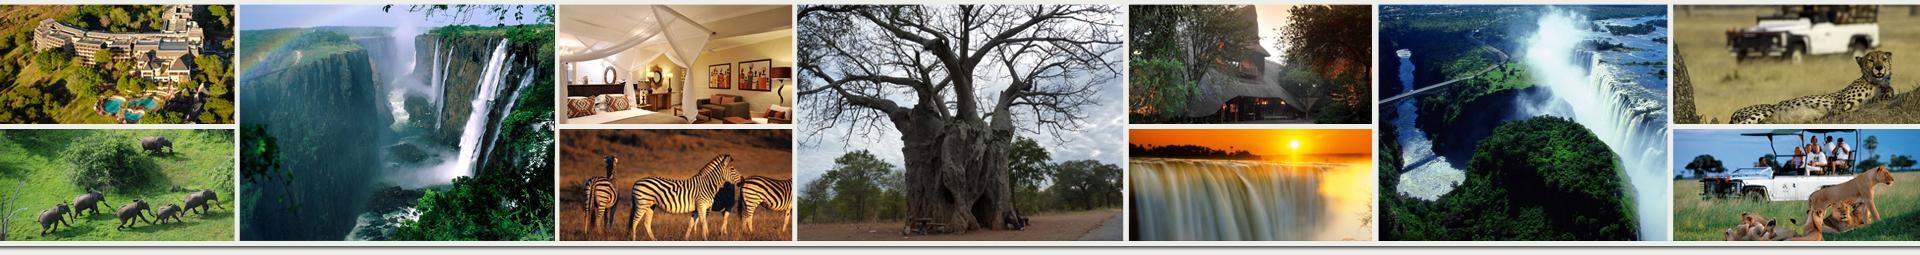 PageLines-ZimbabweHeader.jpg